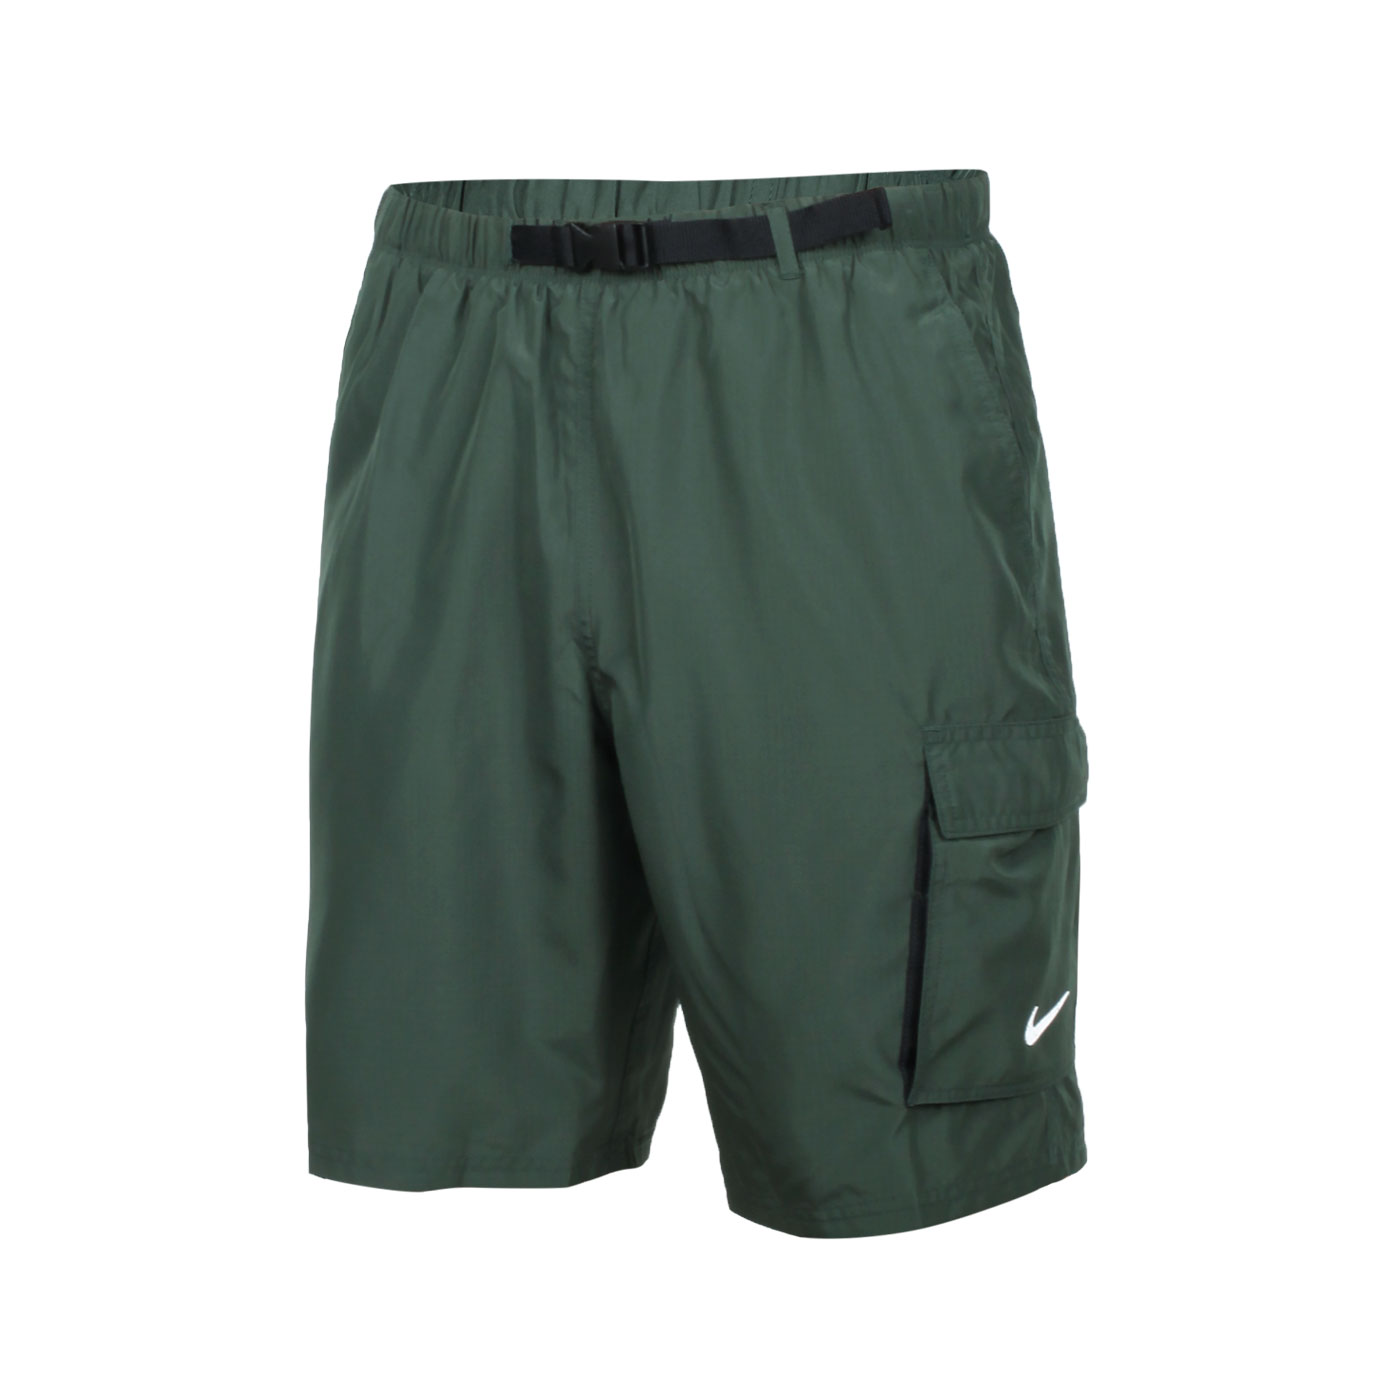 NIKE 男款成人九吋海灘褲 NESSB521-303